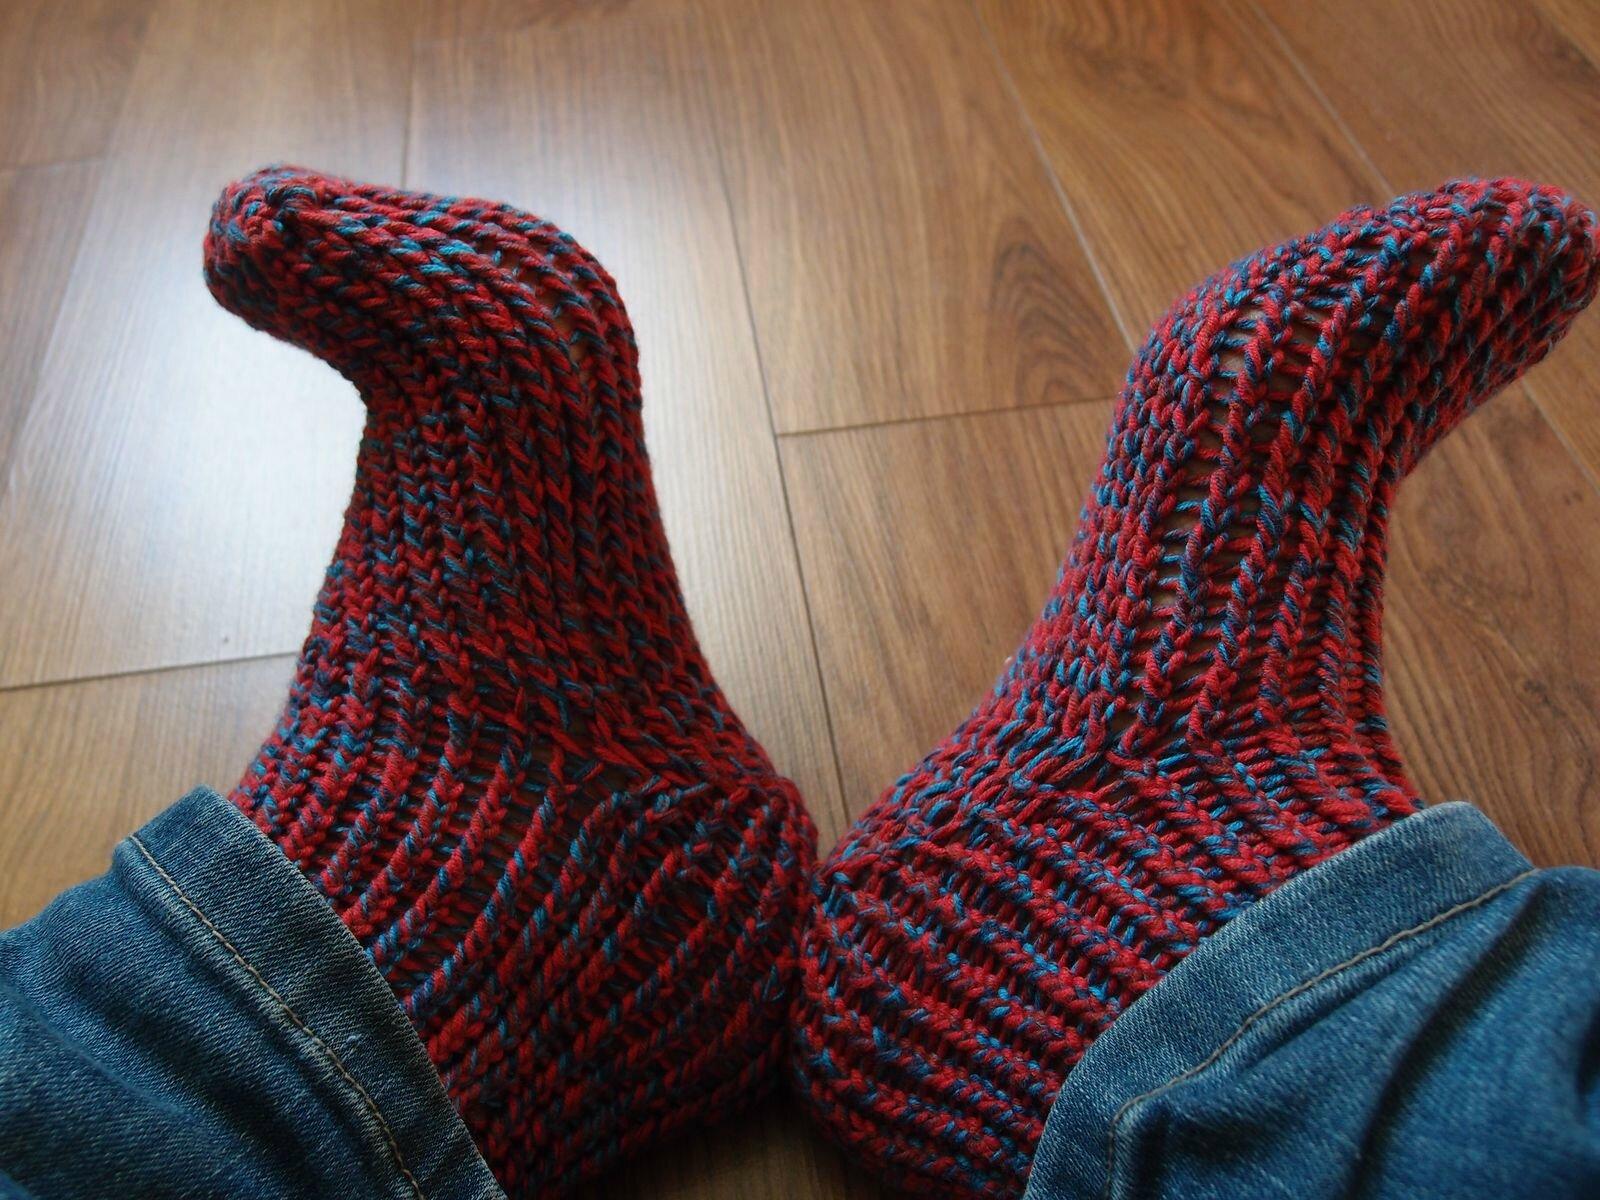 chaussettes tricotin le retour turlututu couture. Black Bedroom Furniture Sets. Home Design Ideas